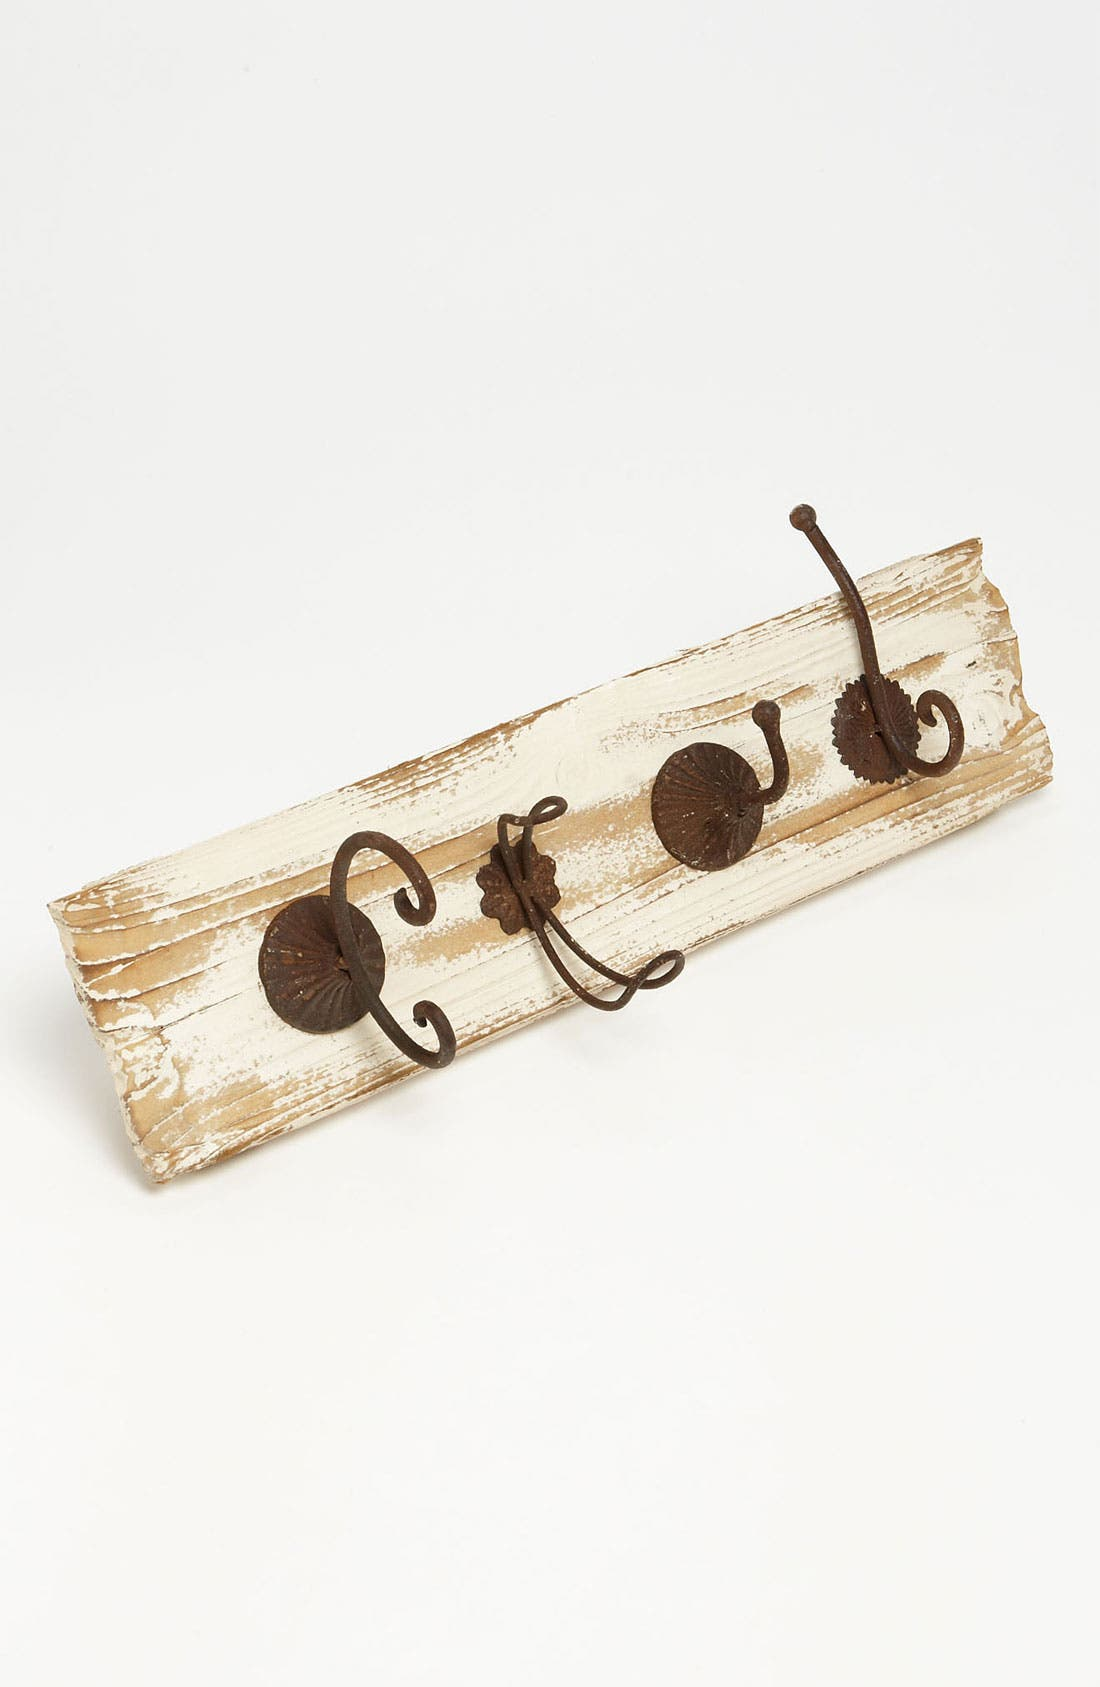 Alternate Image 1 Selected - Distressed Wood Coat Rack